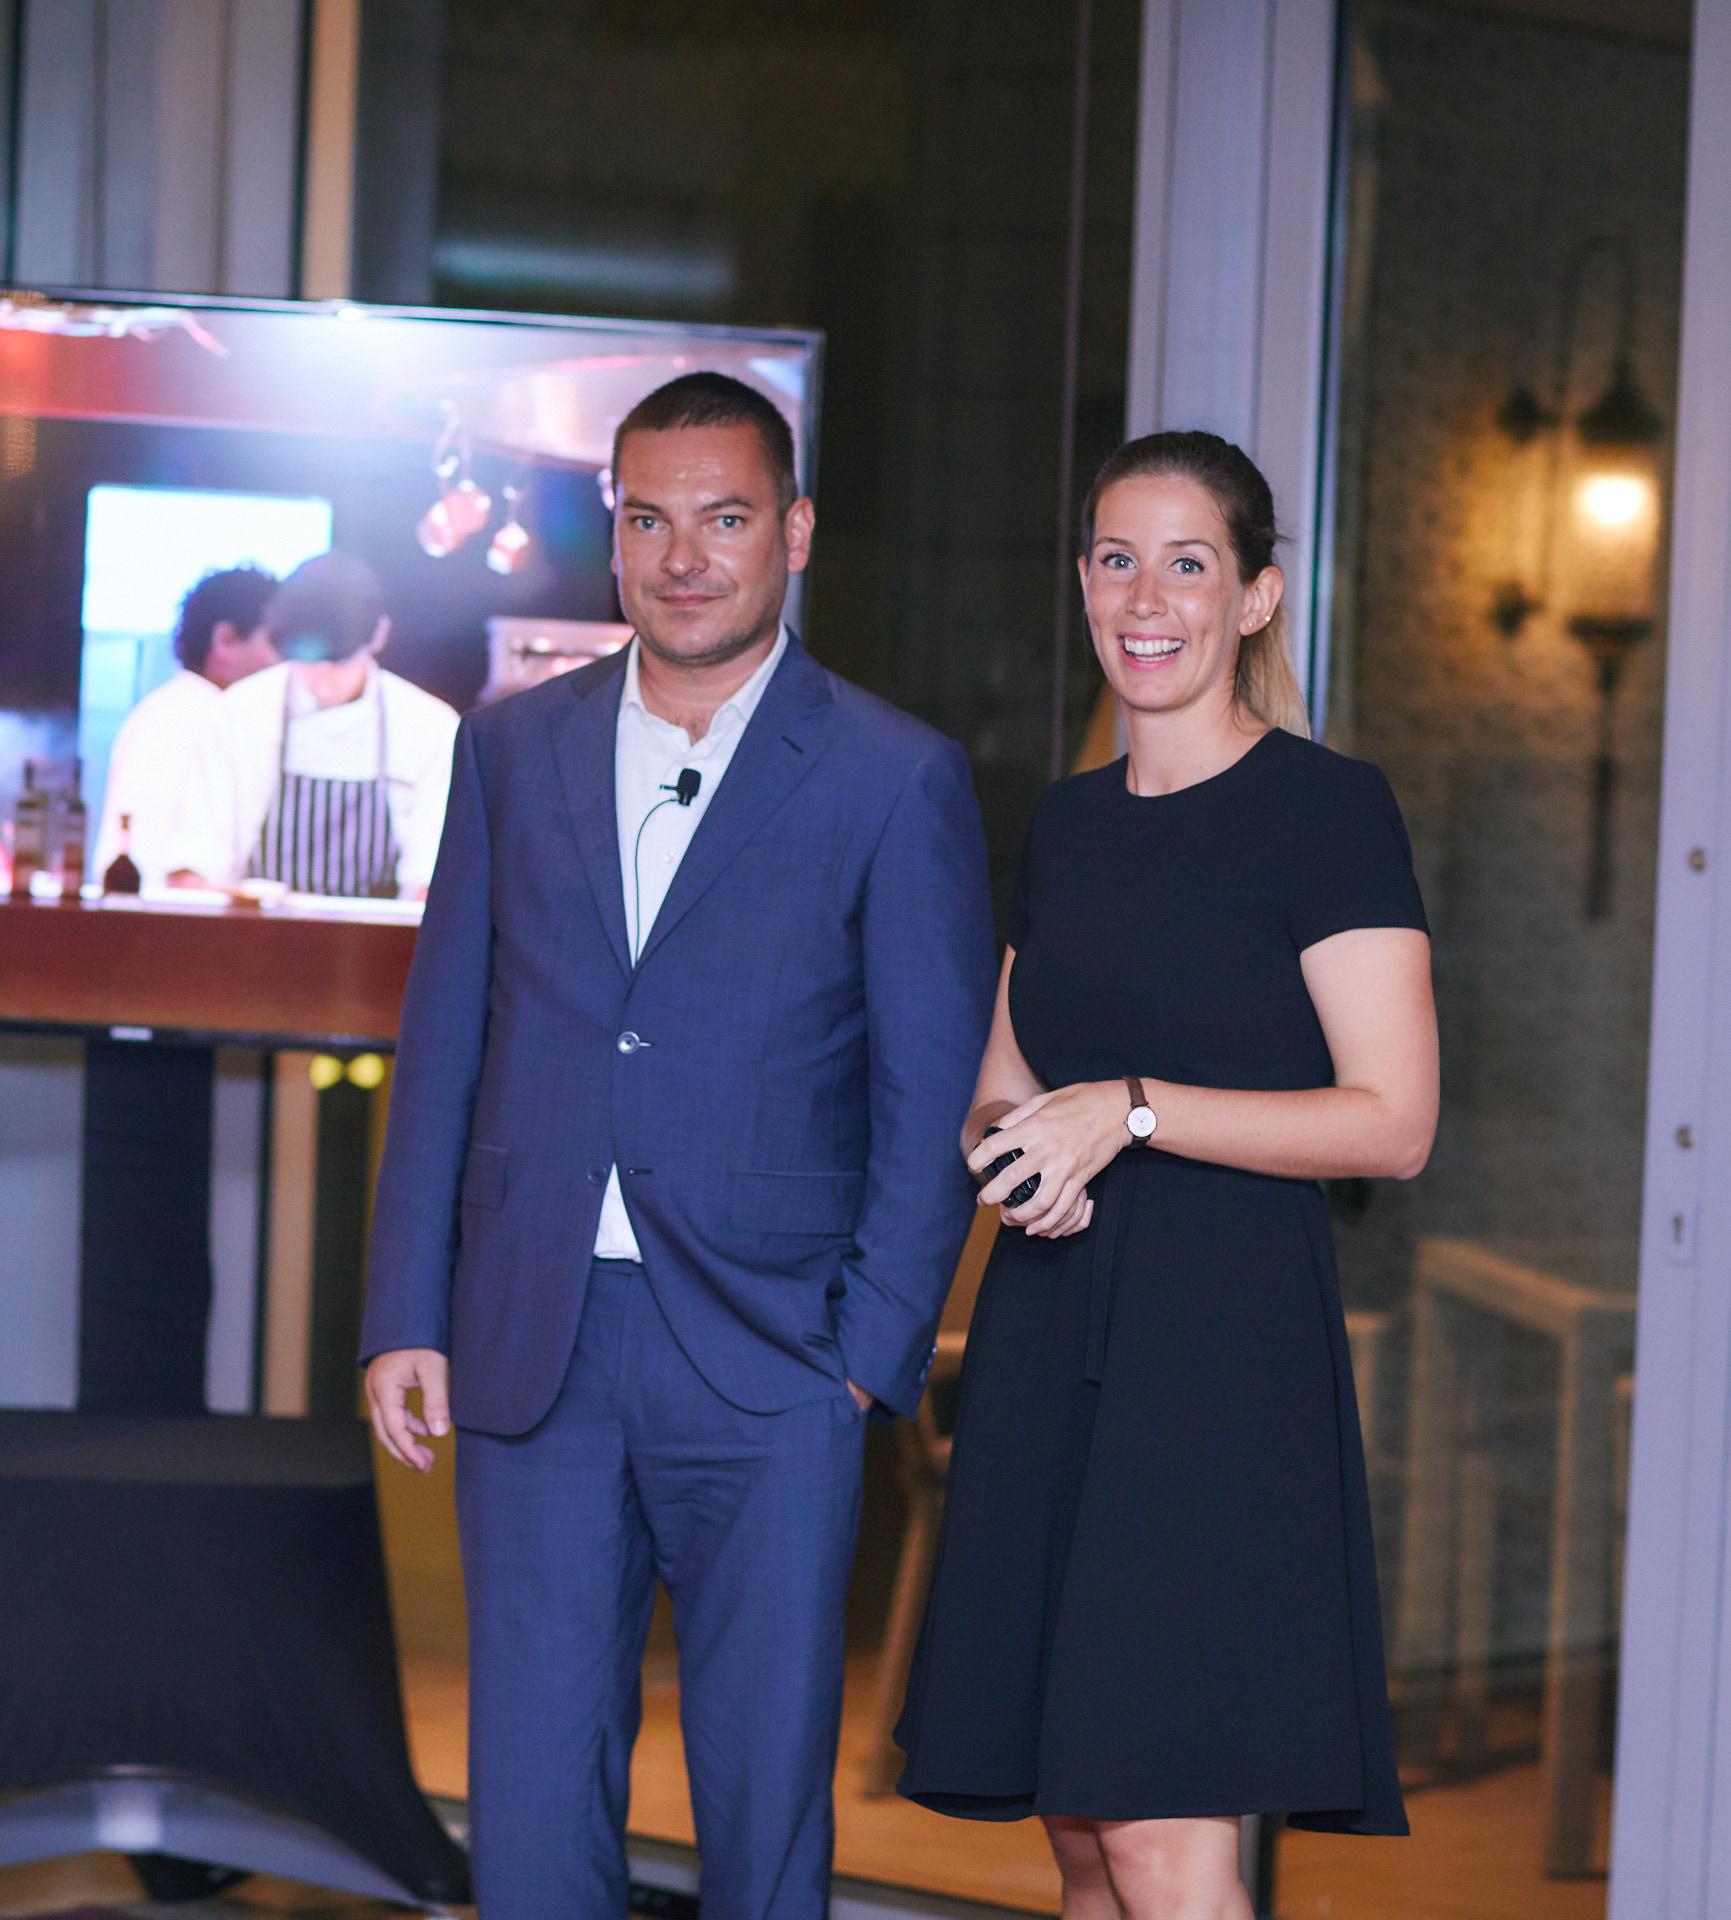 Vela Private Island announces new GM at exclusive ATM event in Dubai